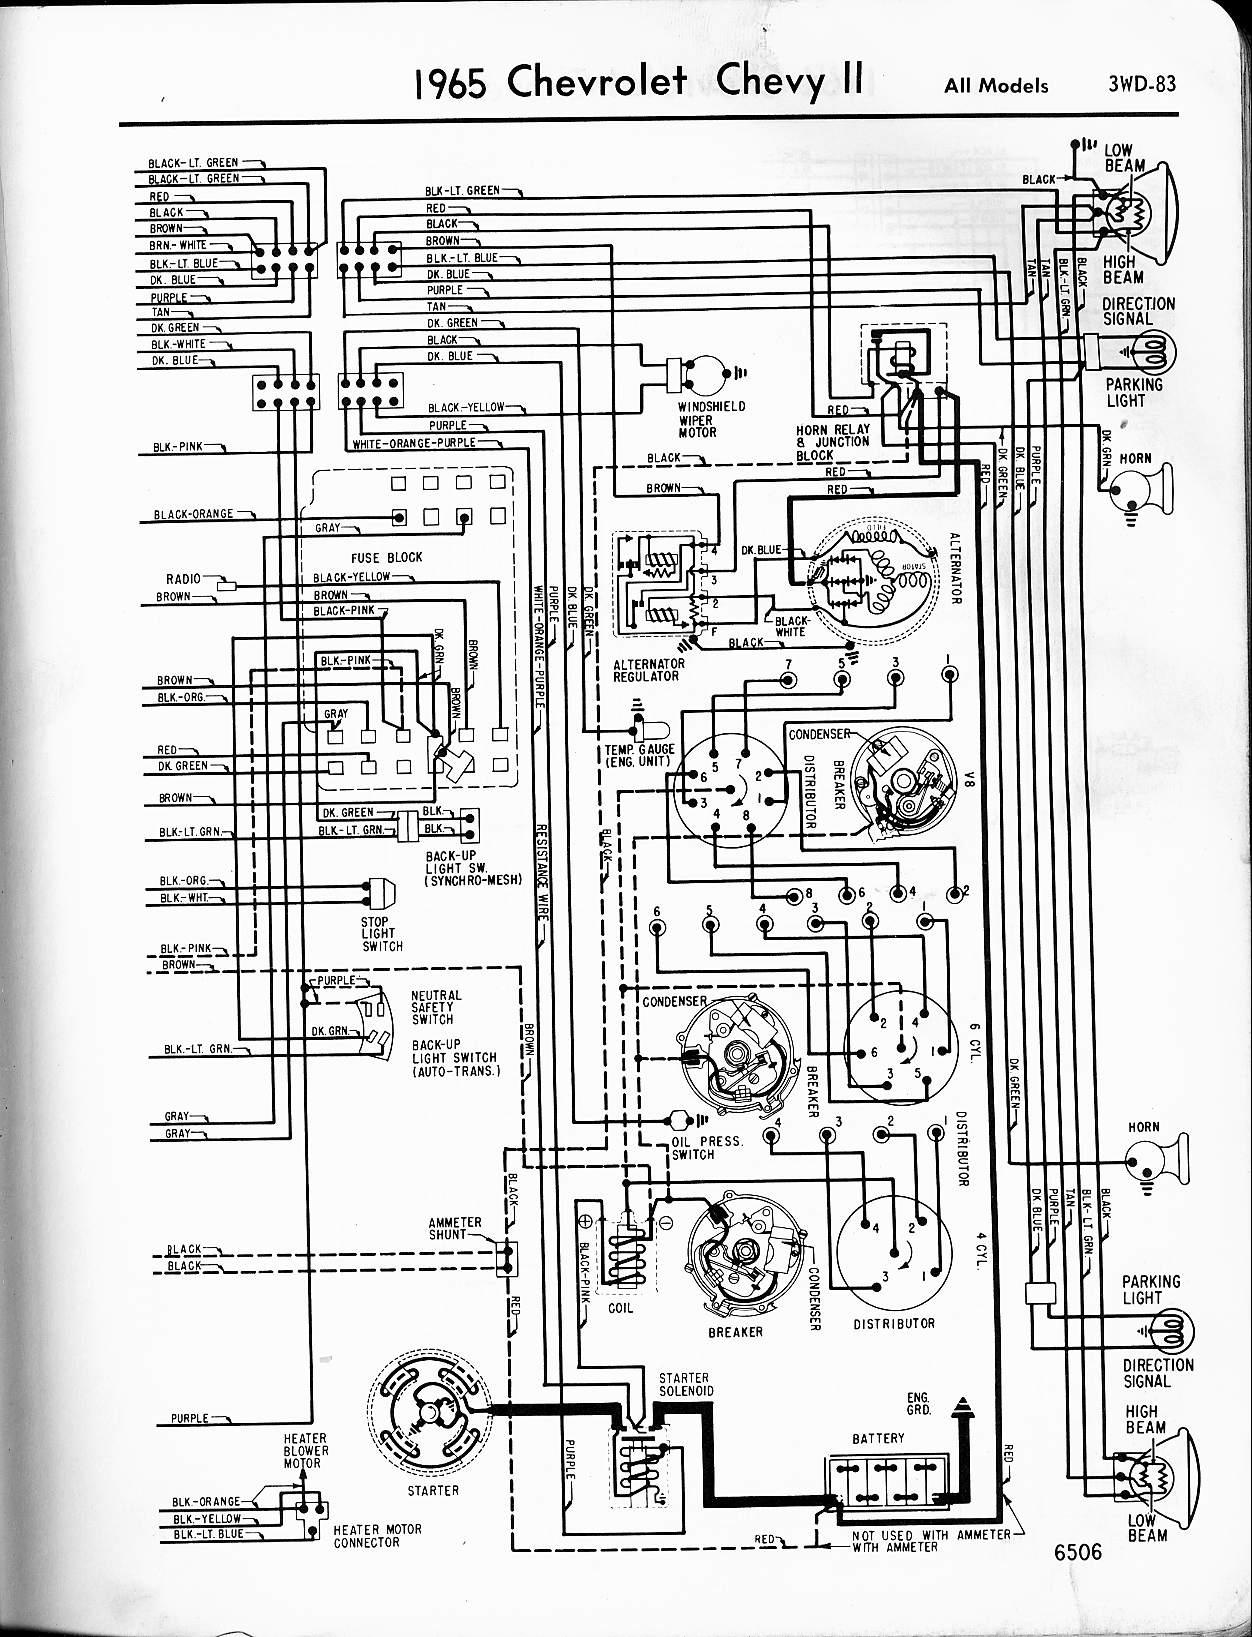 Magnificent Crazy Wiring Diagram No Messy Wiring Not Lossing Wiring Diagram Wiring Digital Resources Lavecompassionincorg